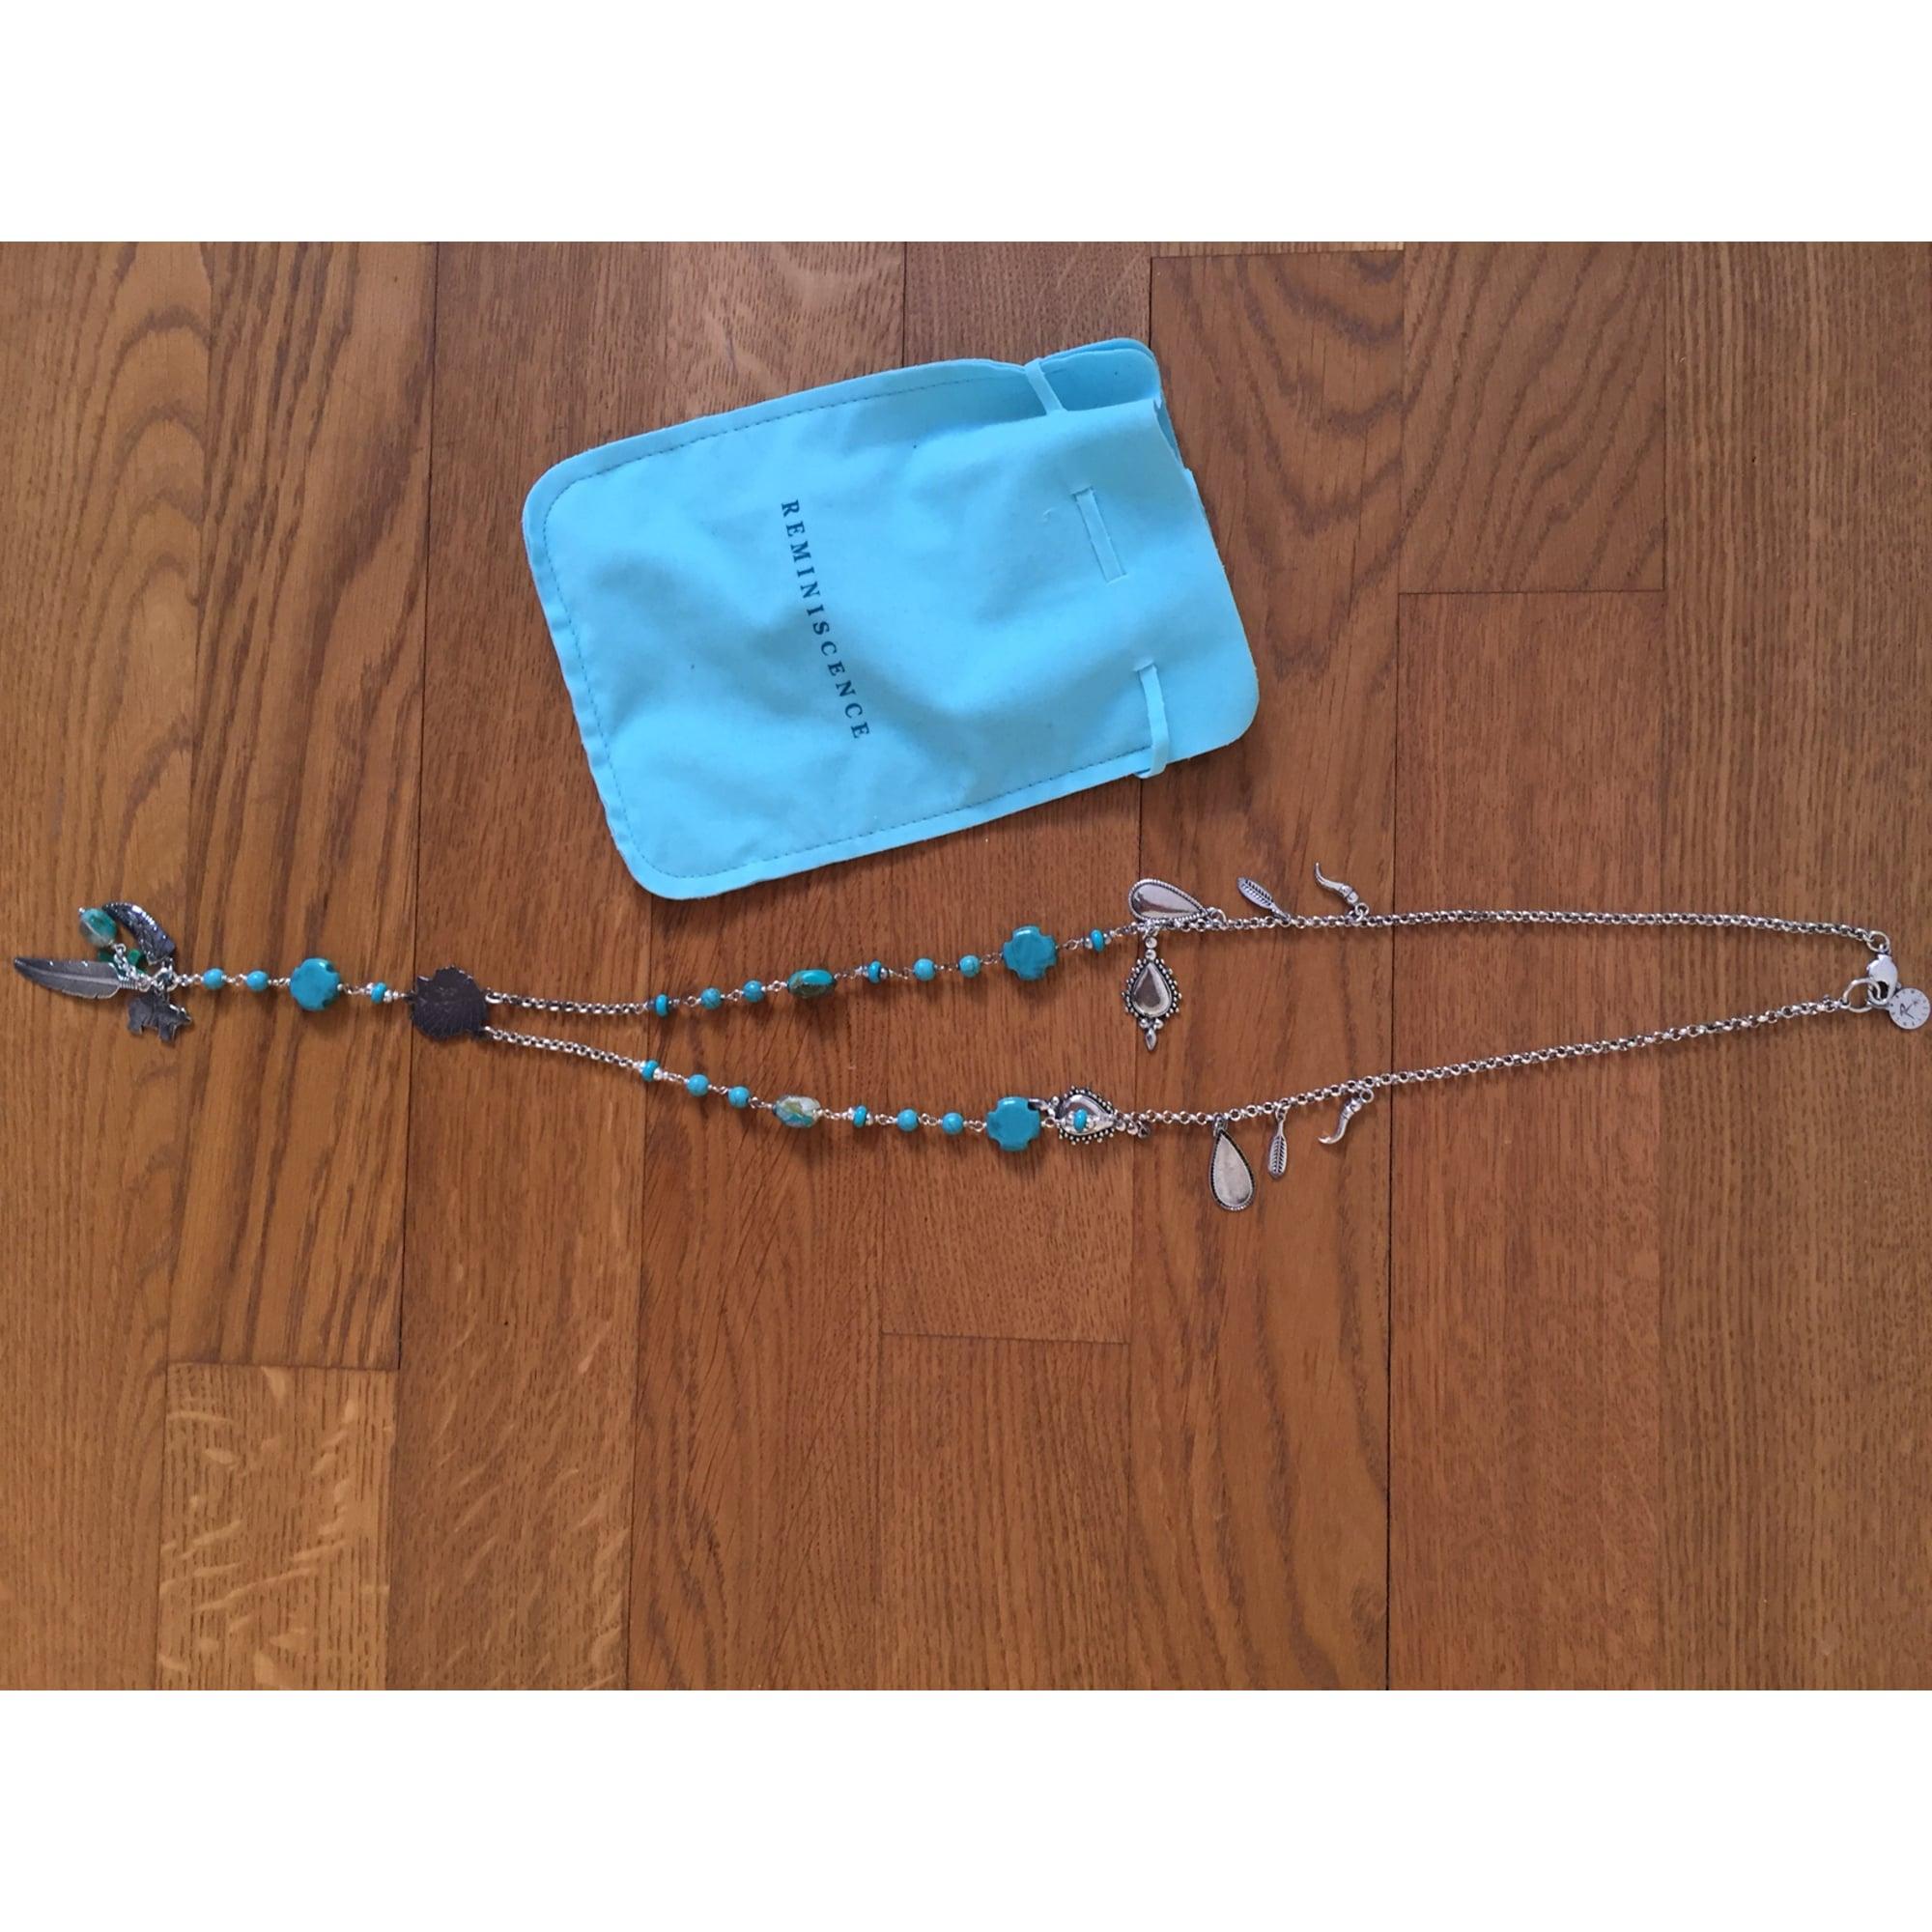 Pendentif, collier pendentif REMINISCENCE Bleu, bleu marine, bleu turquoise